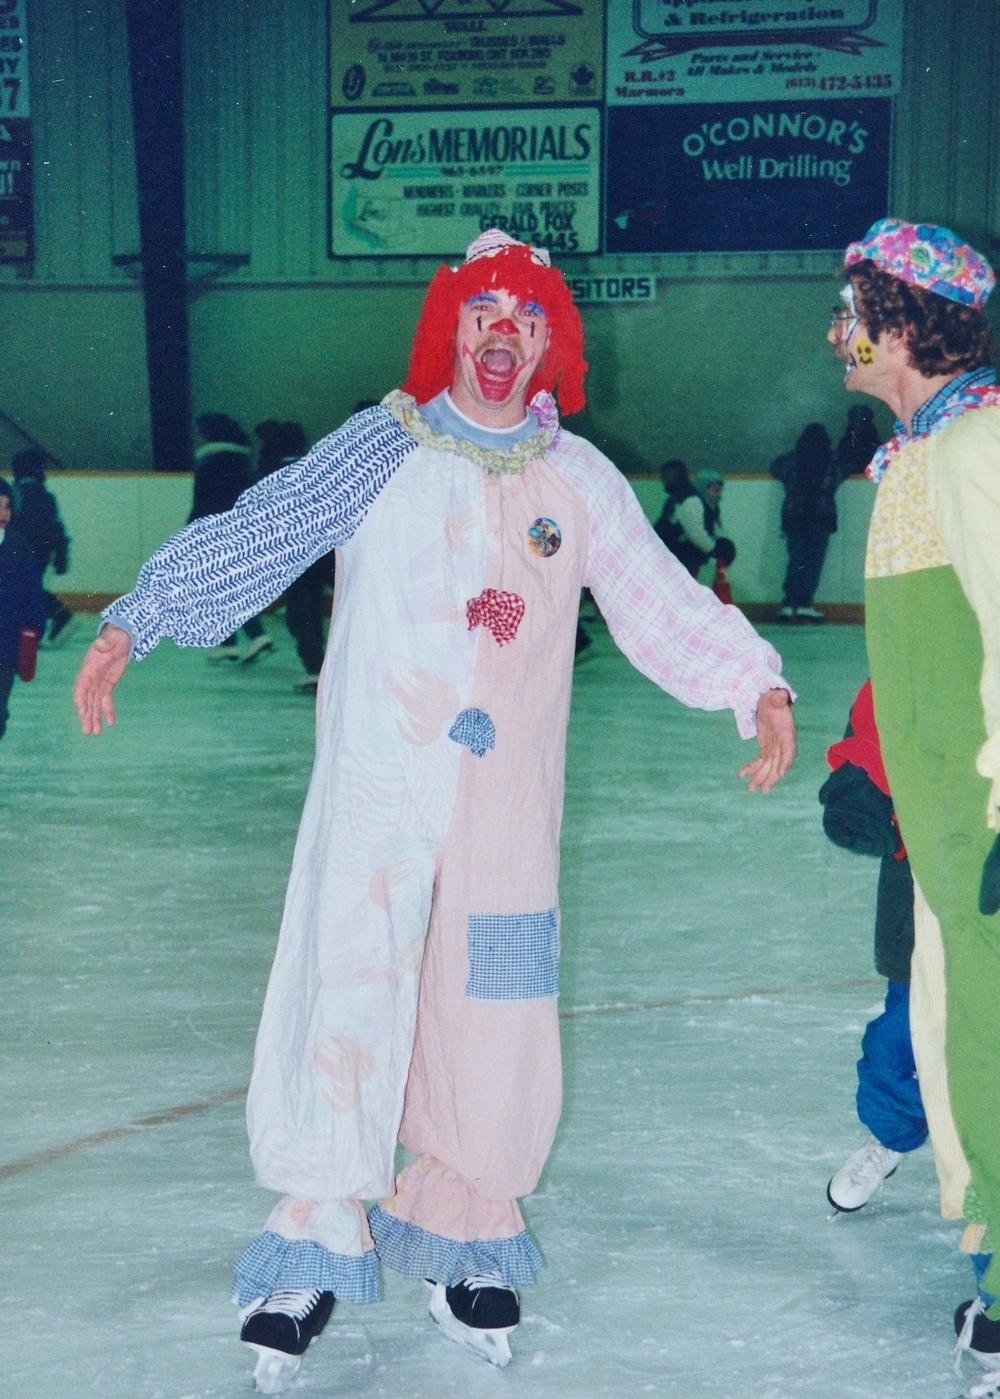 1997 Snofest Skte-a-thon Bruce Ryles